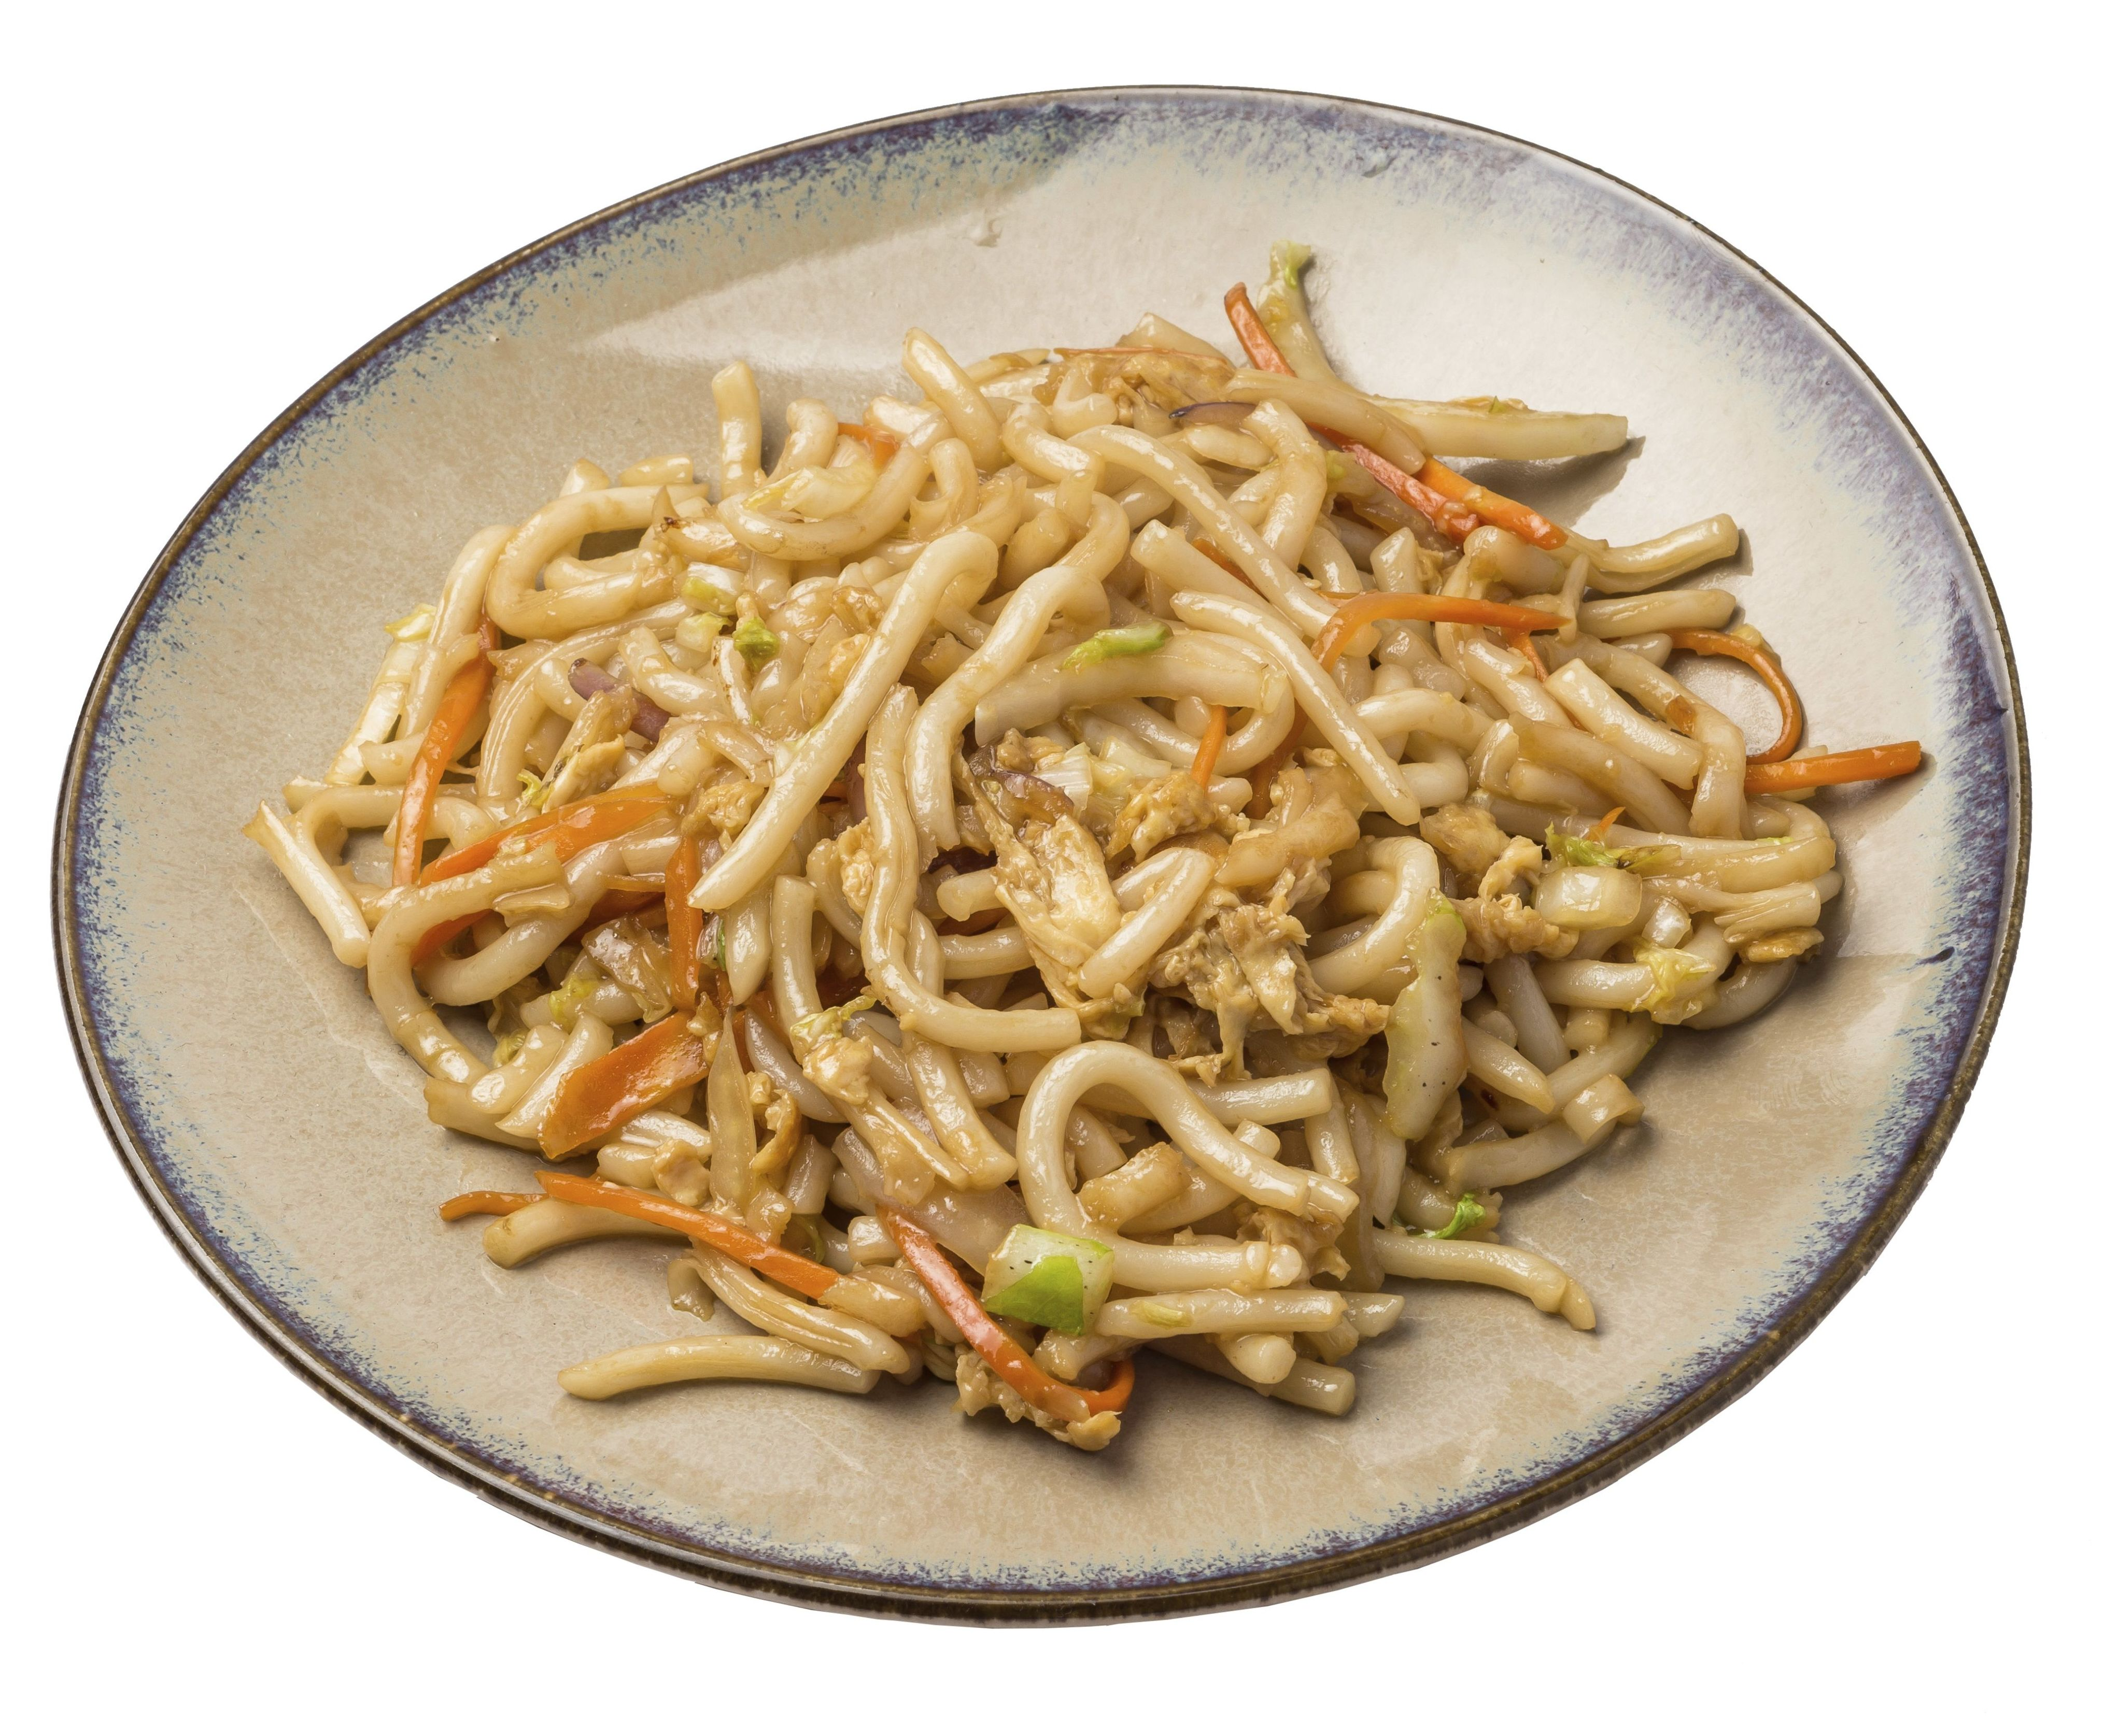 Udon frito con ternera  7,80€: Carta de Restaurante Sowu